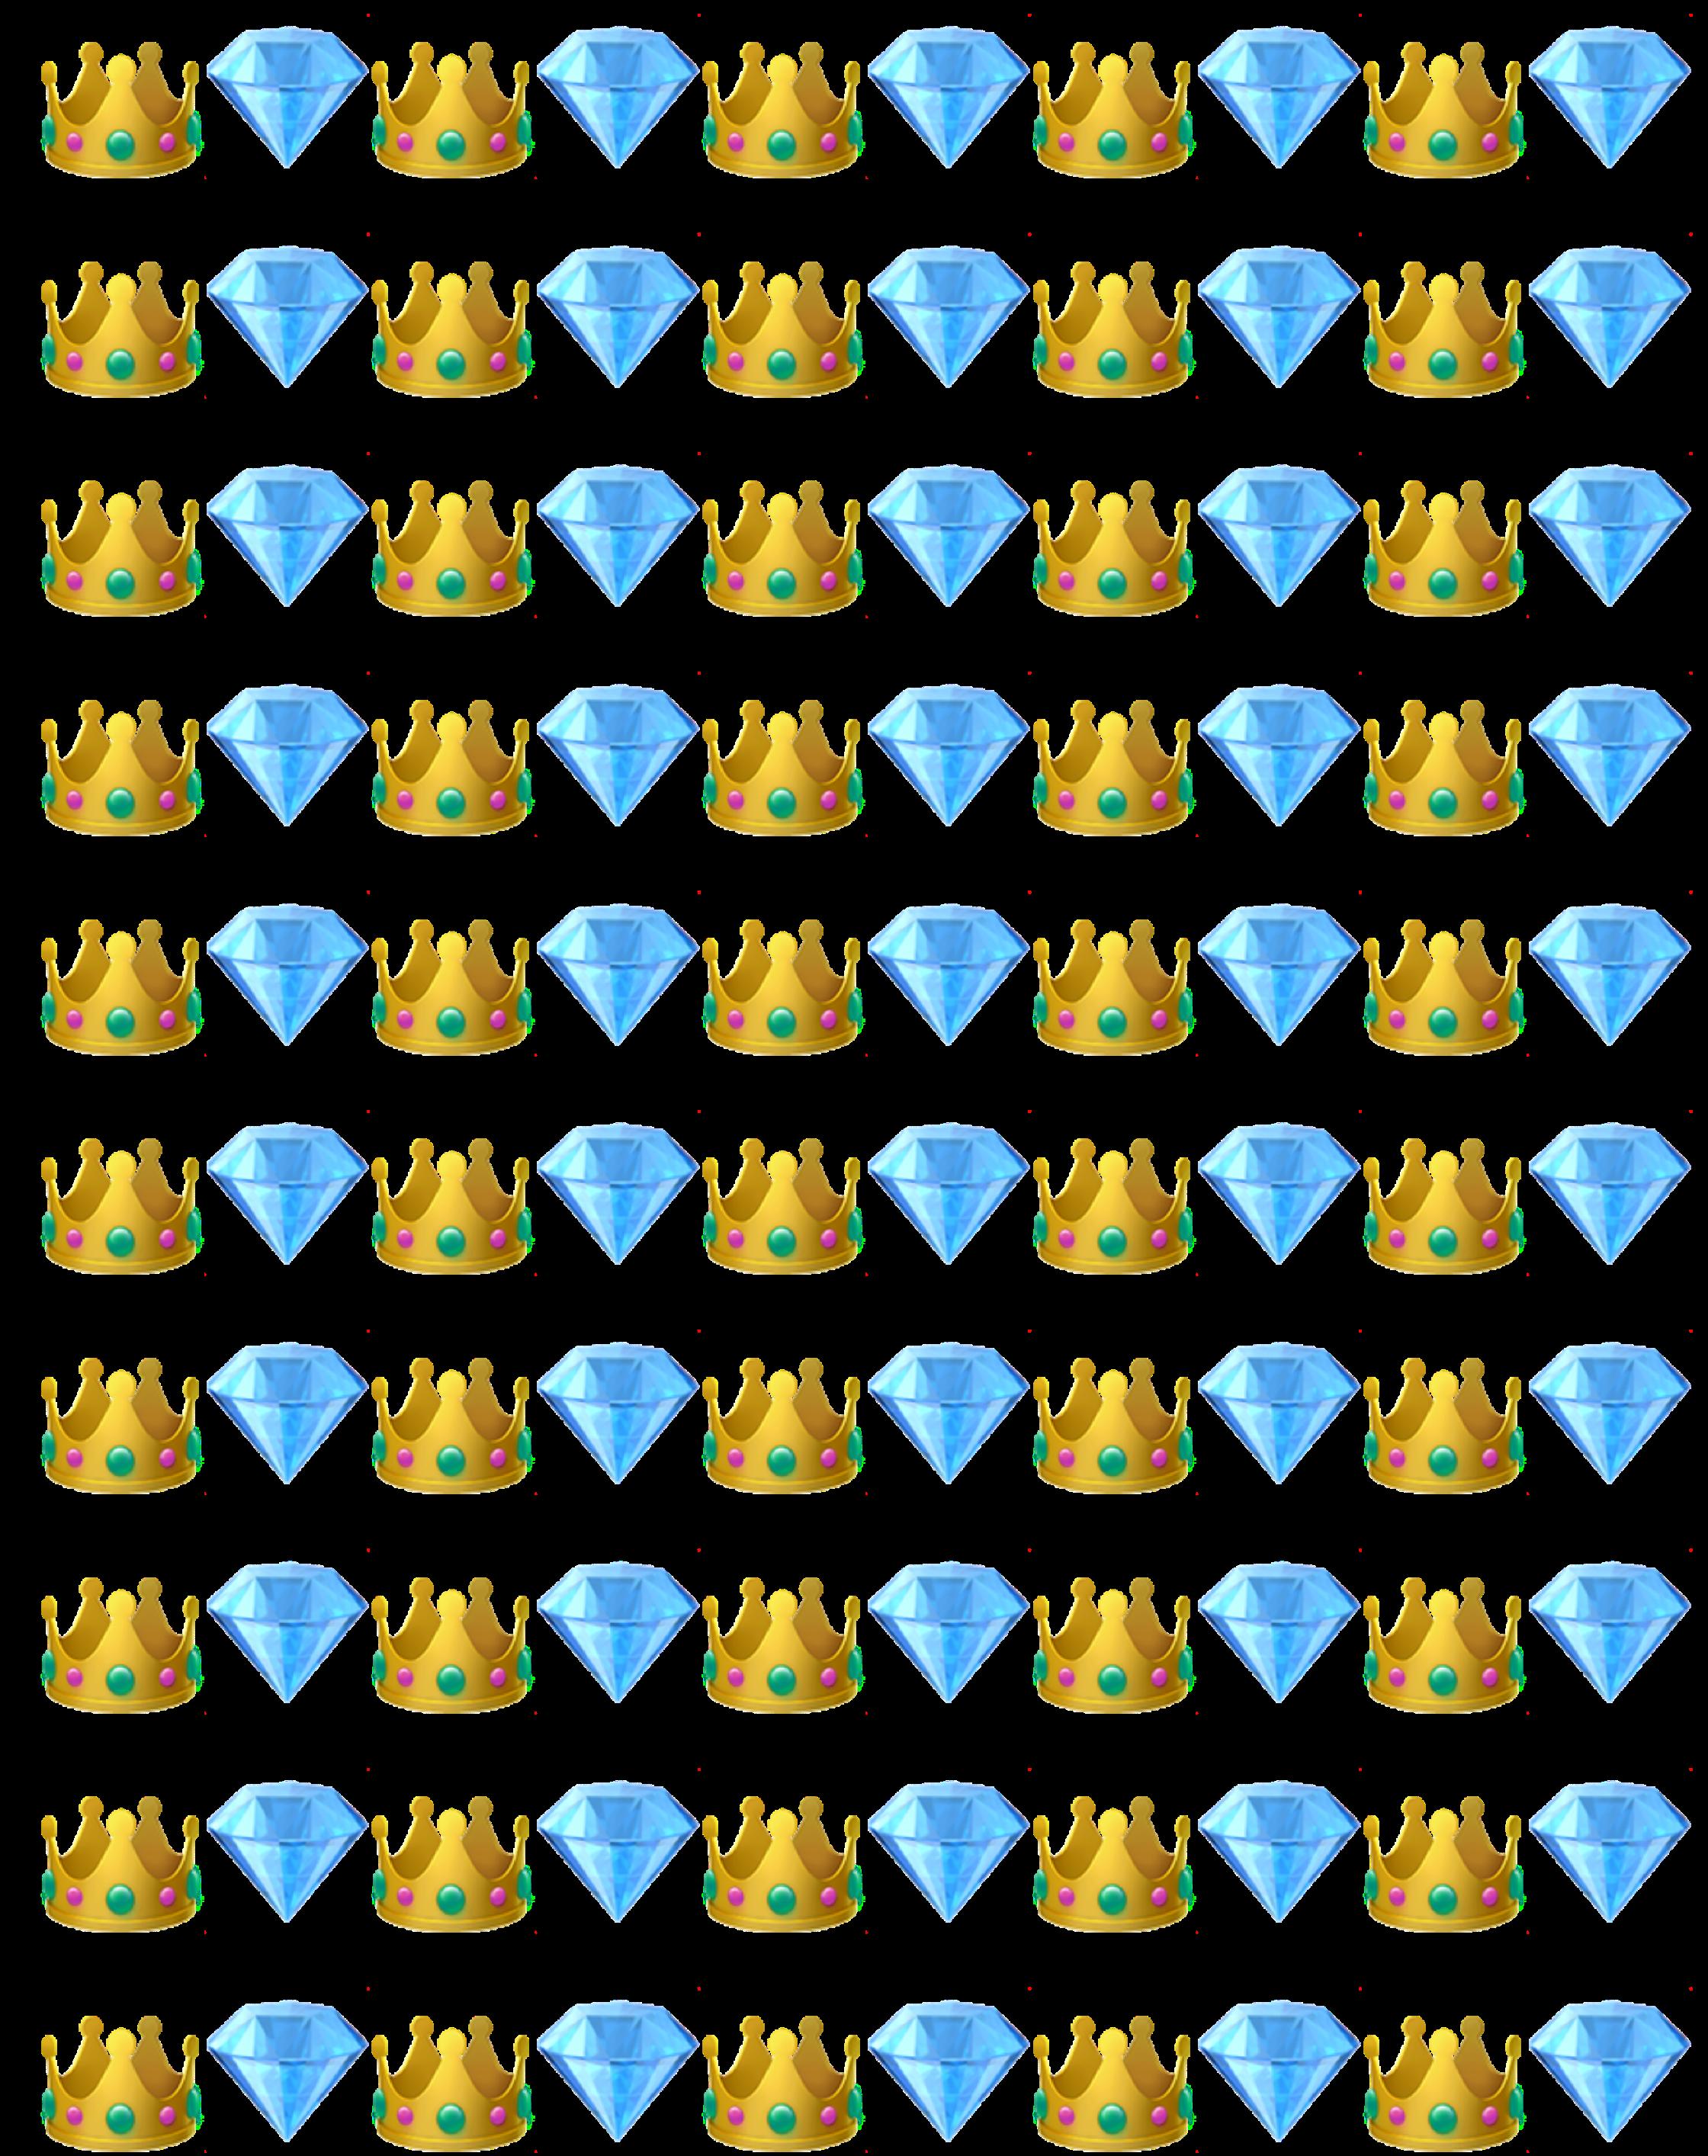 Crown Diamond Diamonds Cool Emoji Emojisticker Emojistickers Freetoedit Remixit Emoji Wallpaper Cute Emoji Wallpaper Cool Emoji